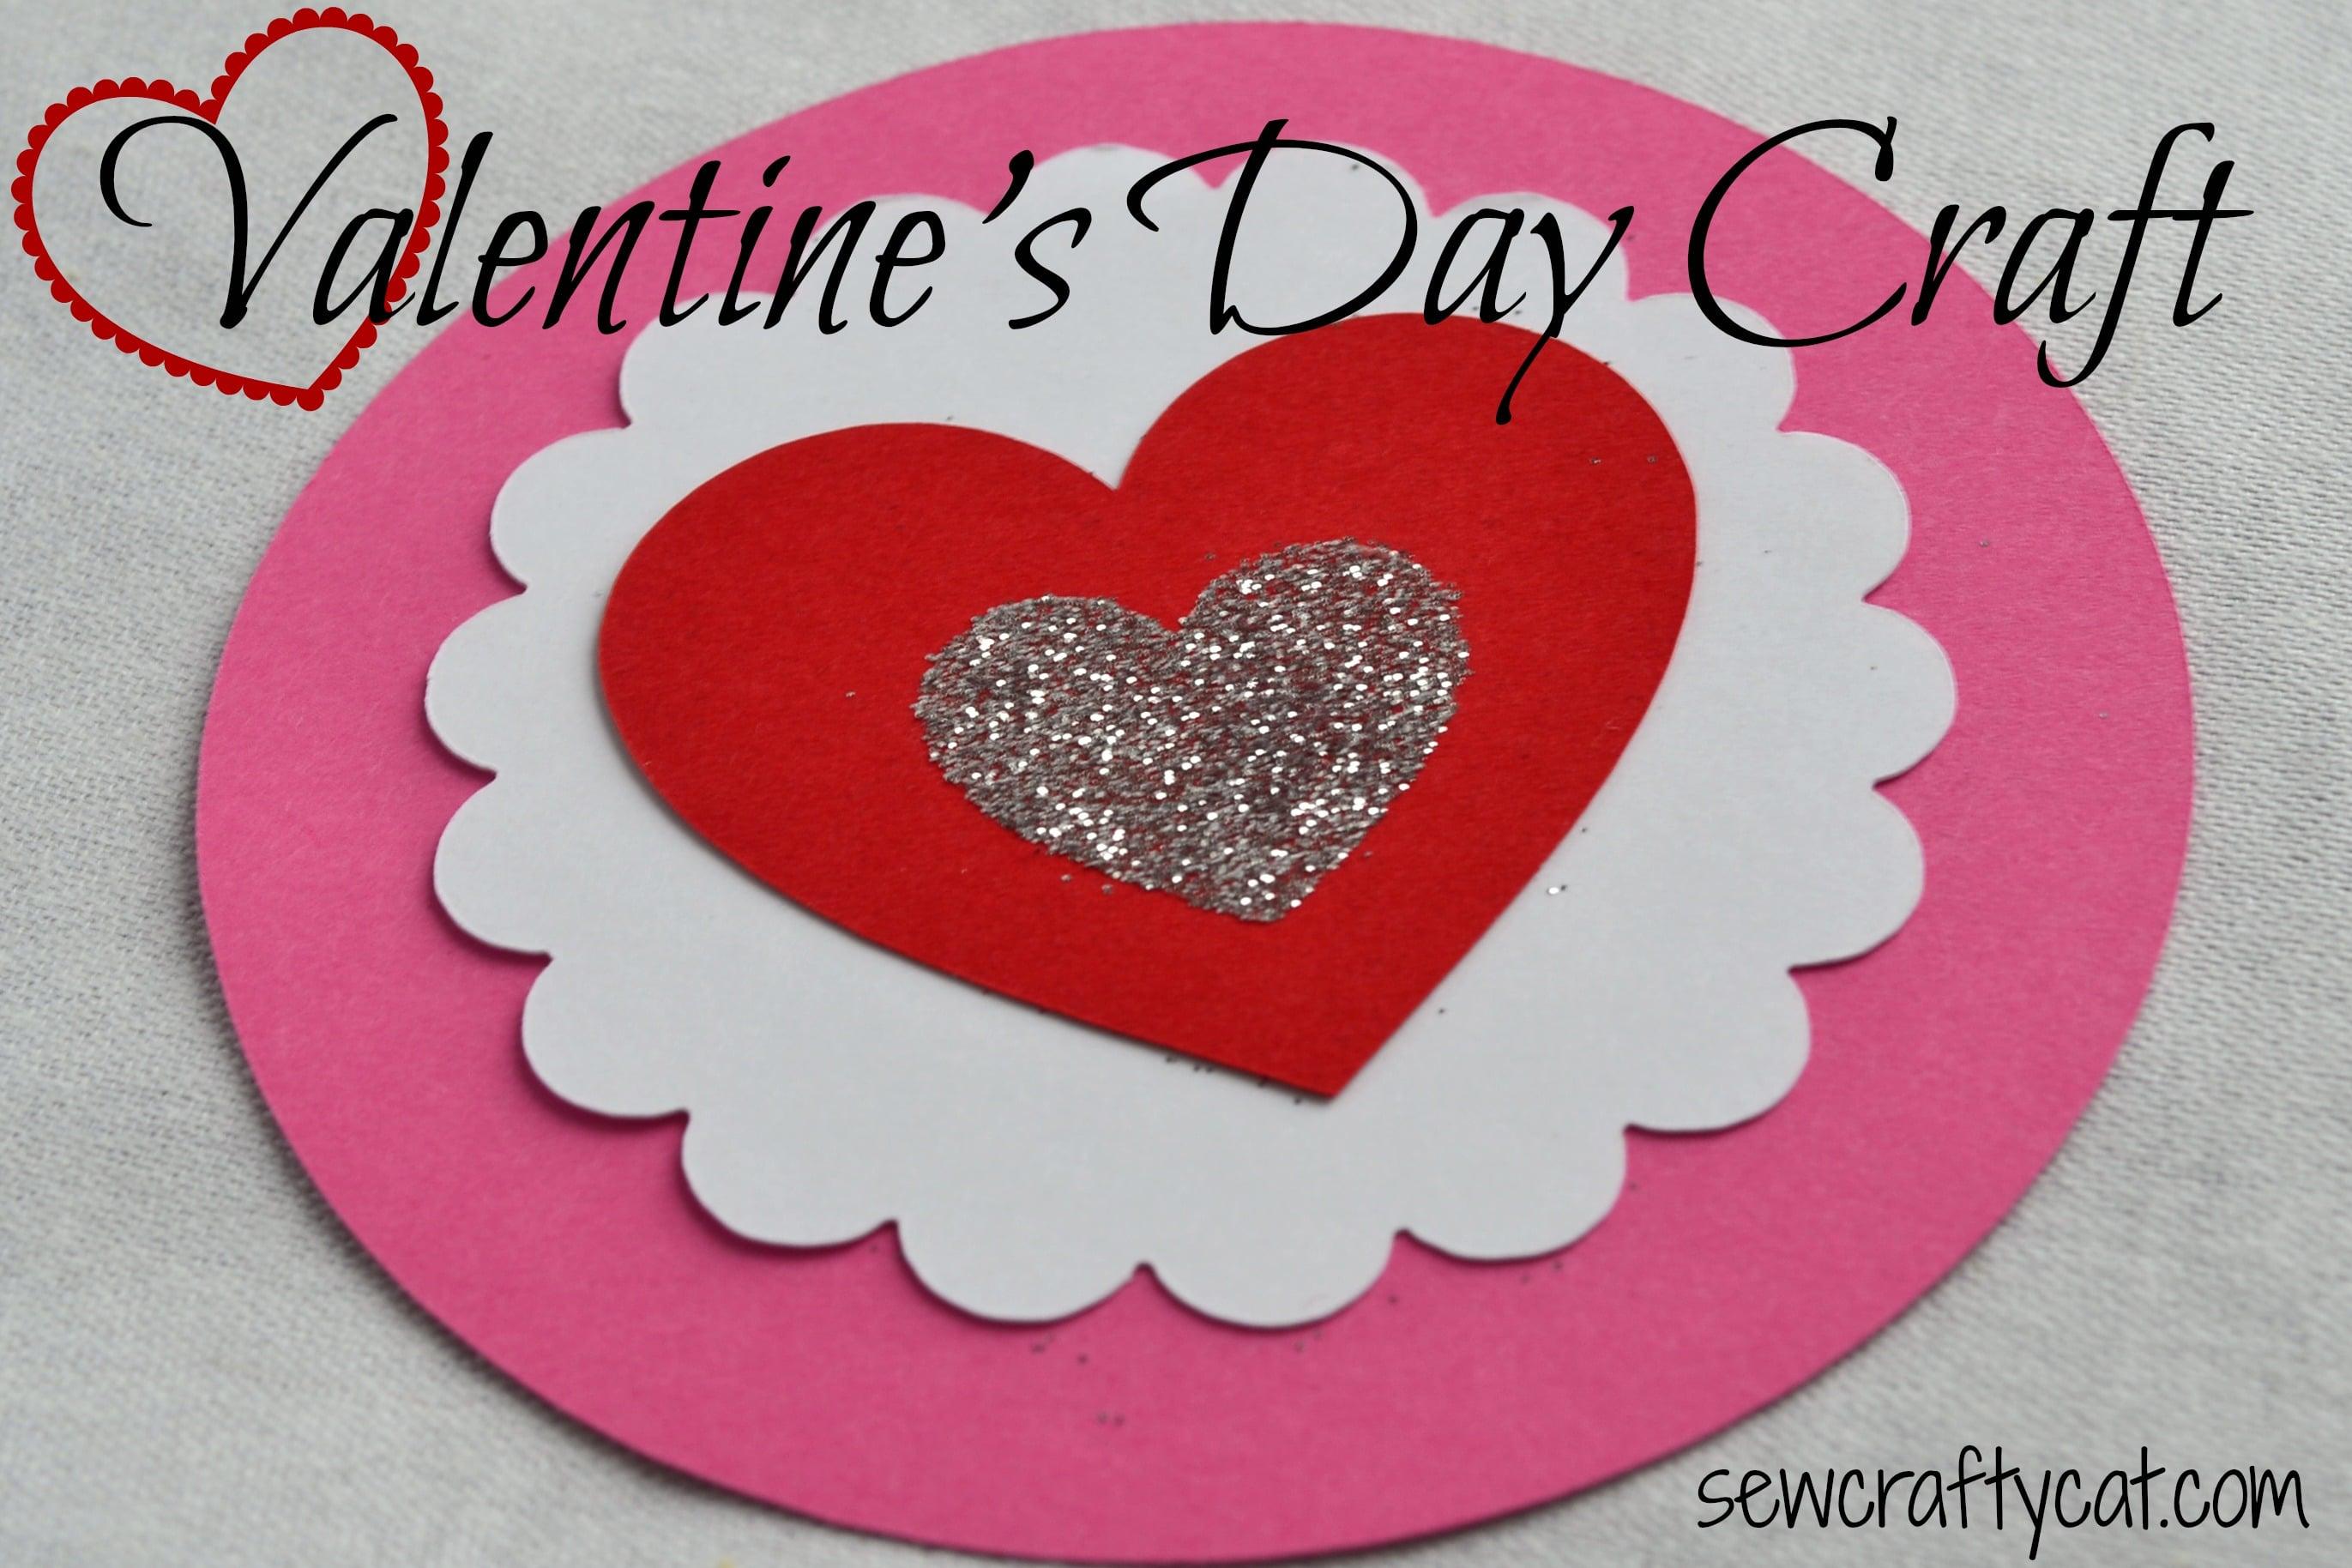 Valentineu0027s Day Paper Craft